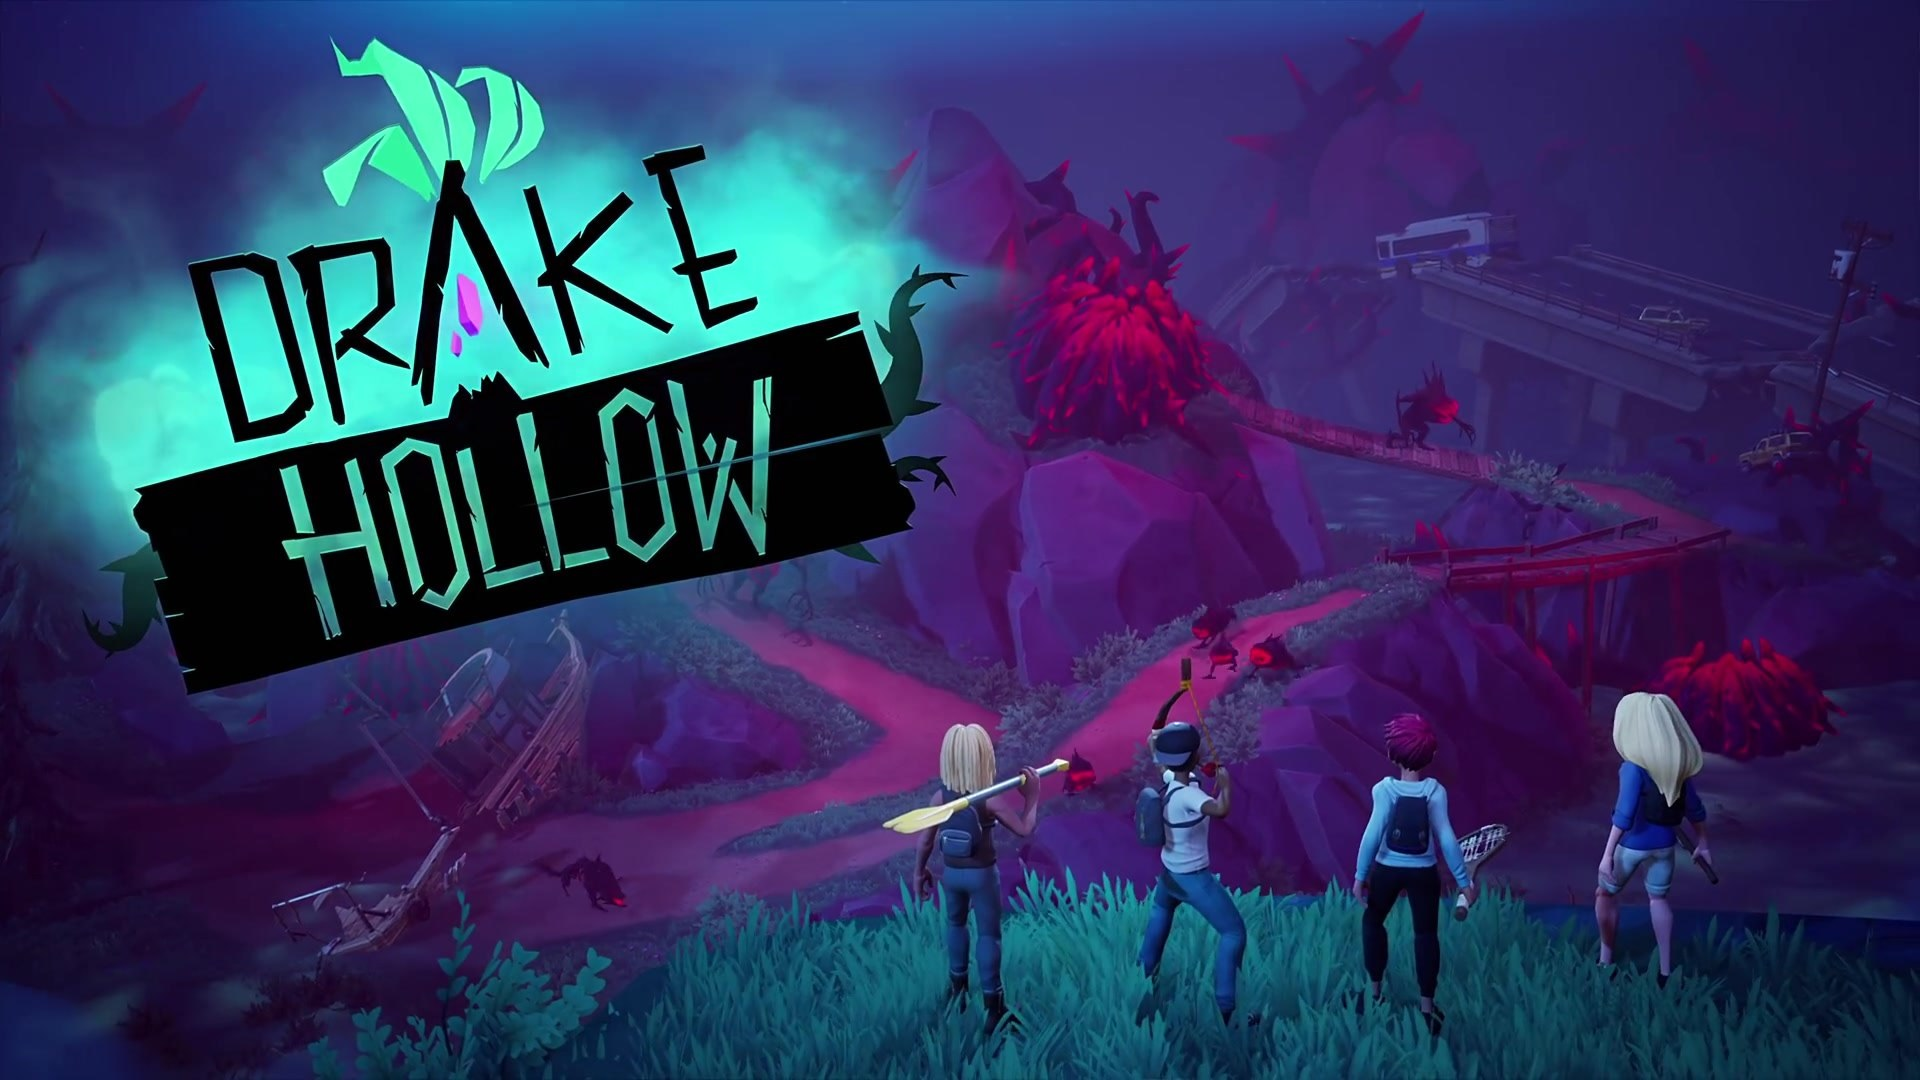 Drake Hollow - The Bramble Beatdown! Free Download